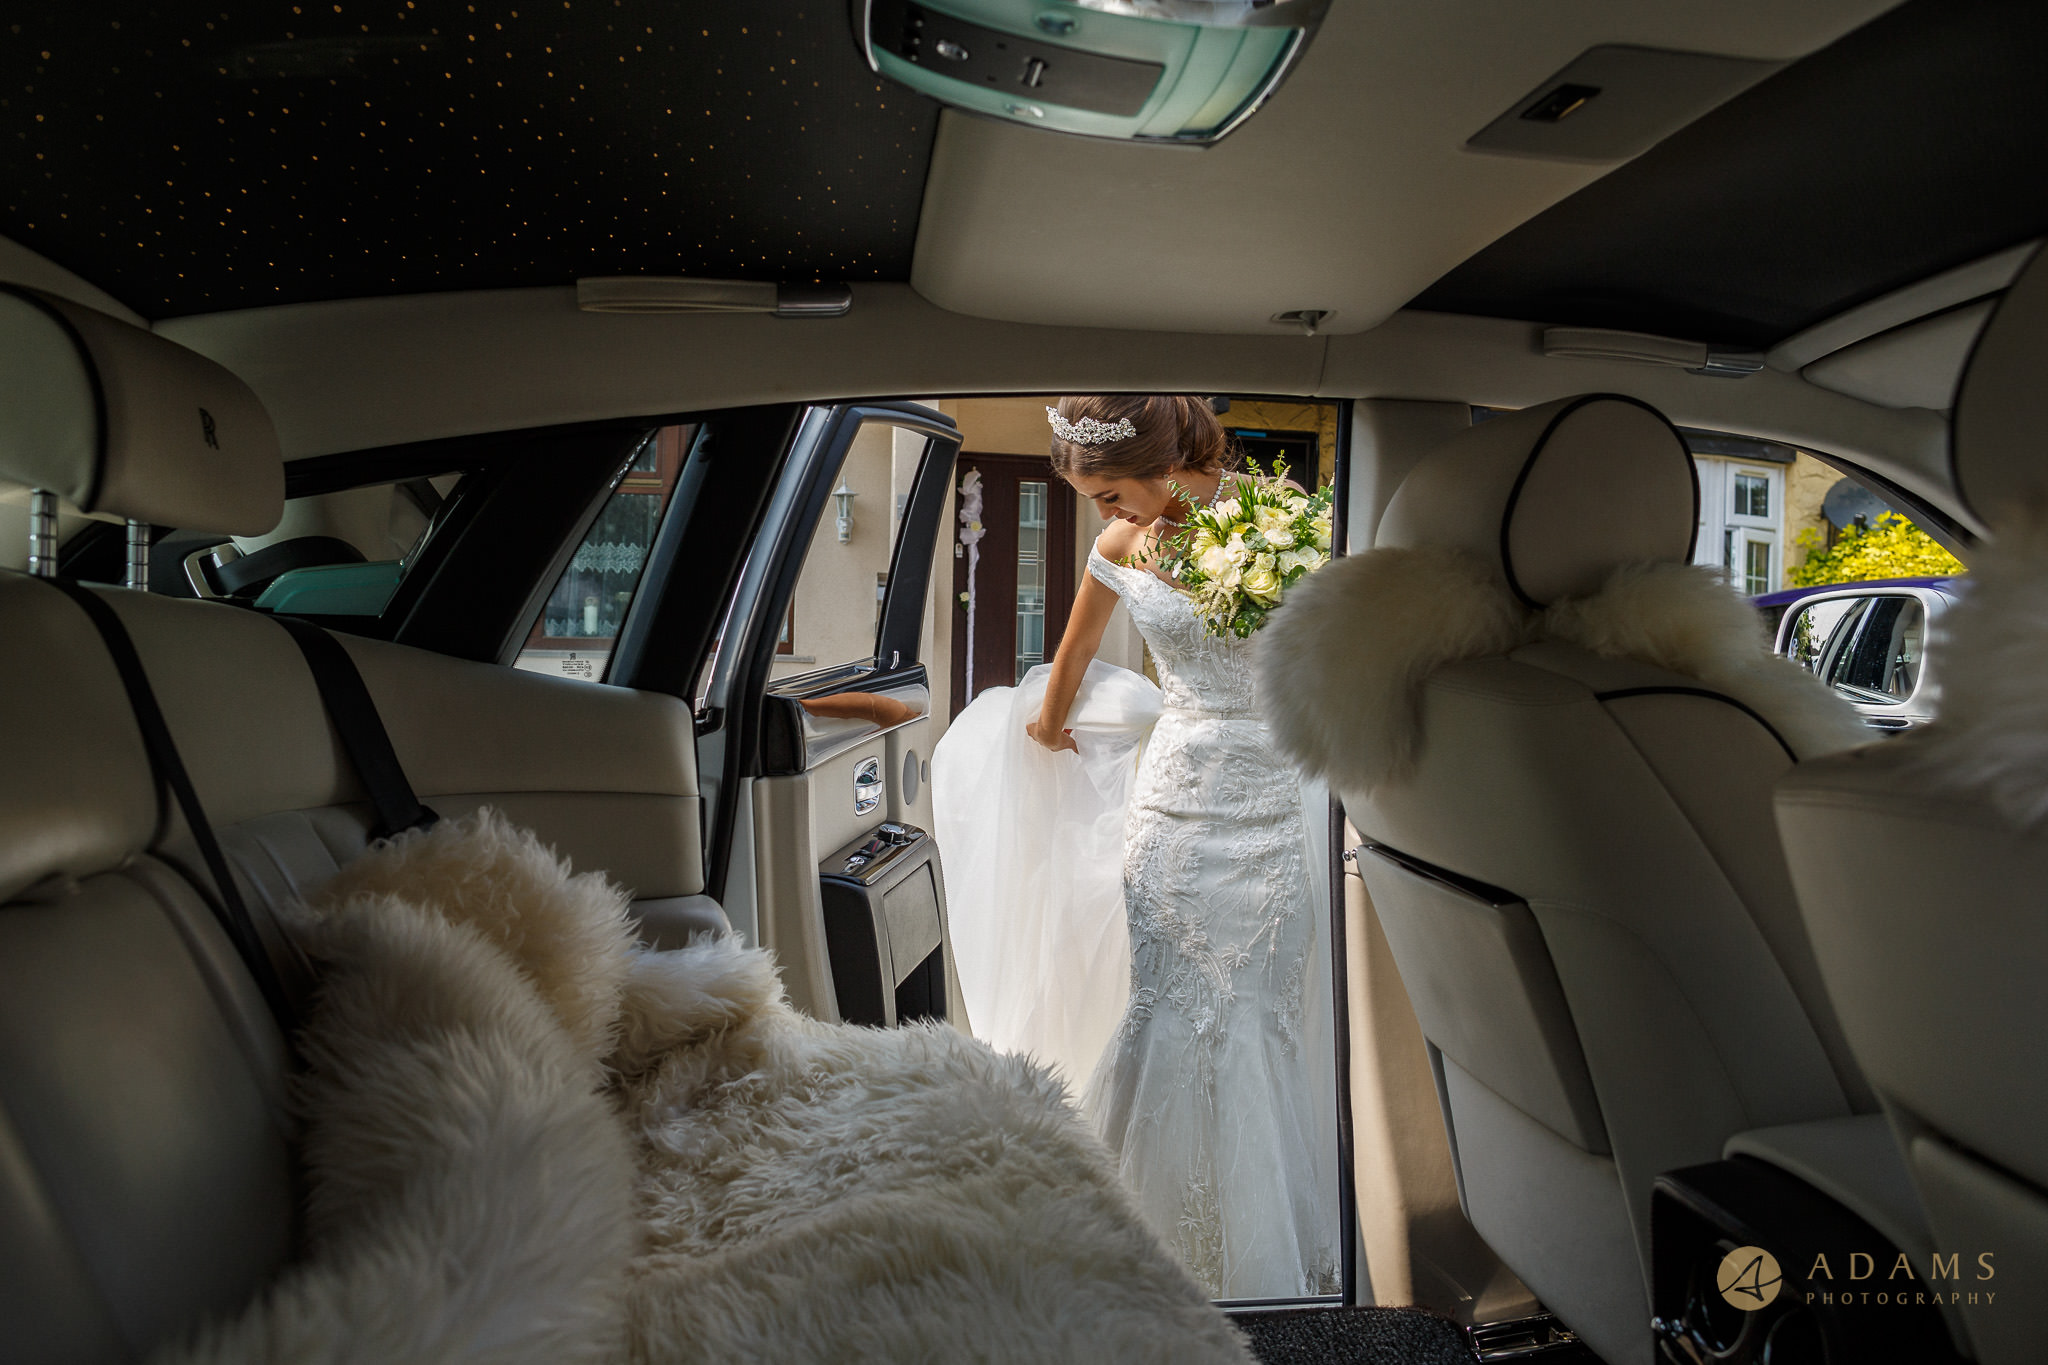 Bride getting into the car